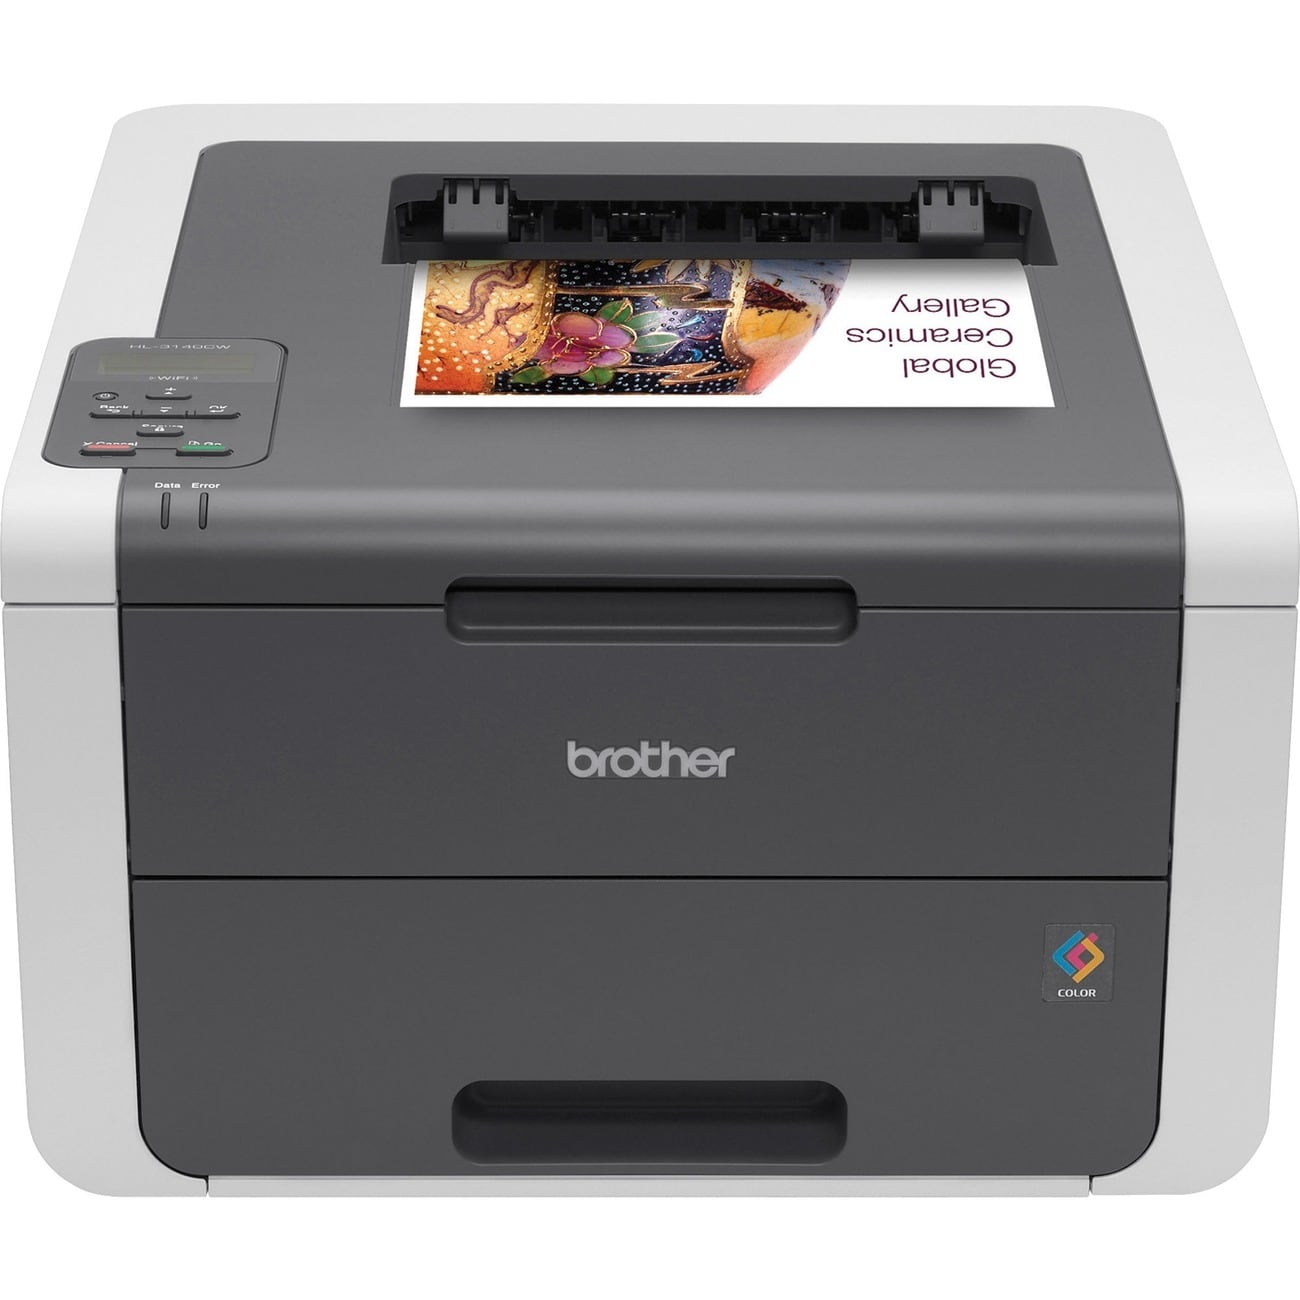 Brother HL-3140CW LED Printer - Color - 2400 x 600 dpi Print - Duplex